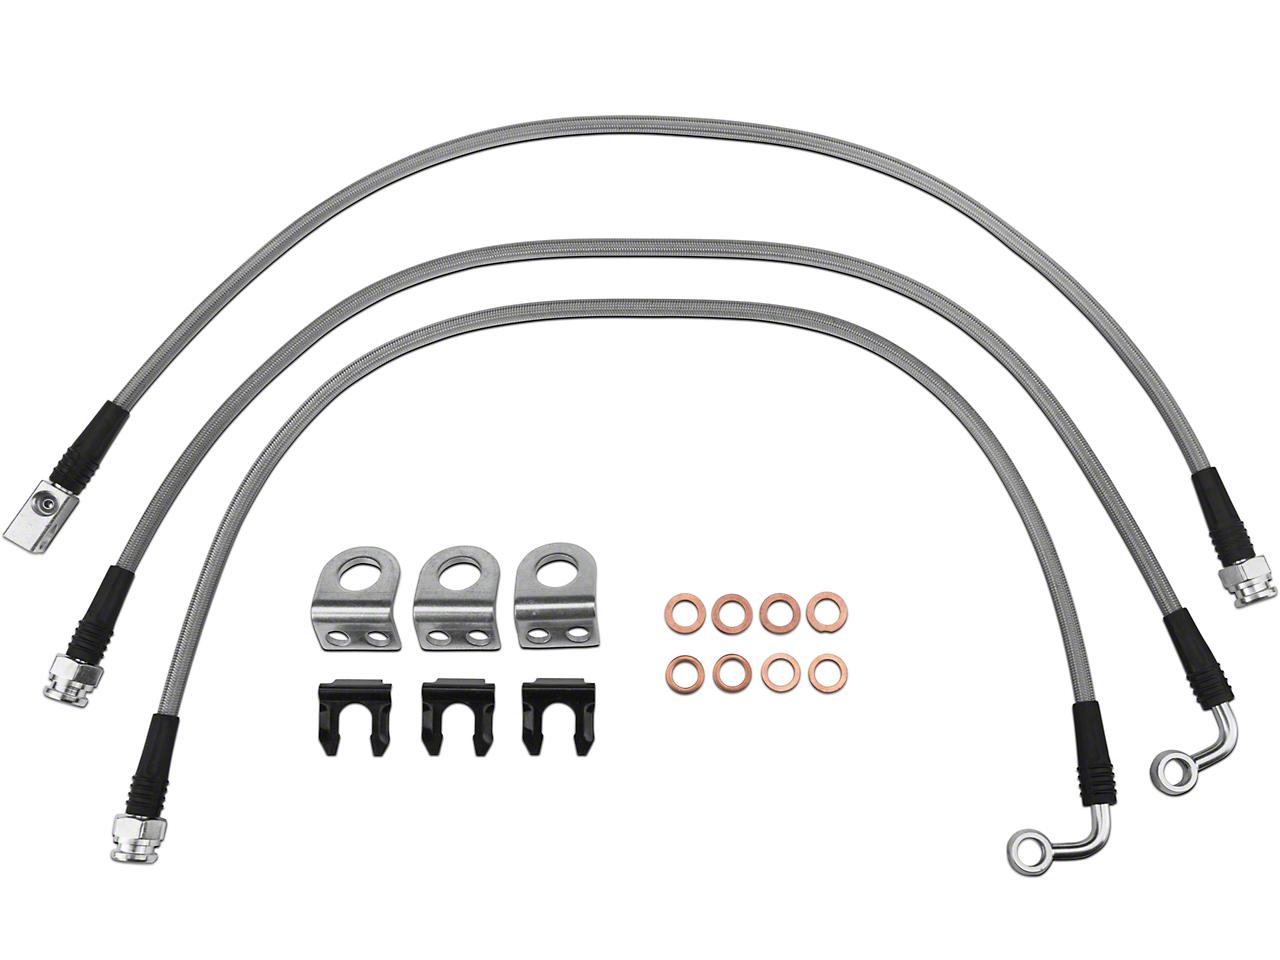 Teraflex Steel Braided Brake Lines - Complete Set (97-06 Jeep Wrangler TJ)